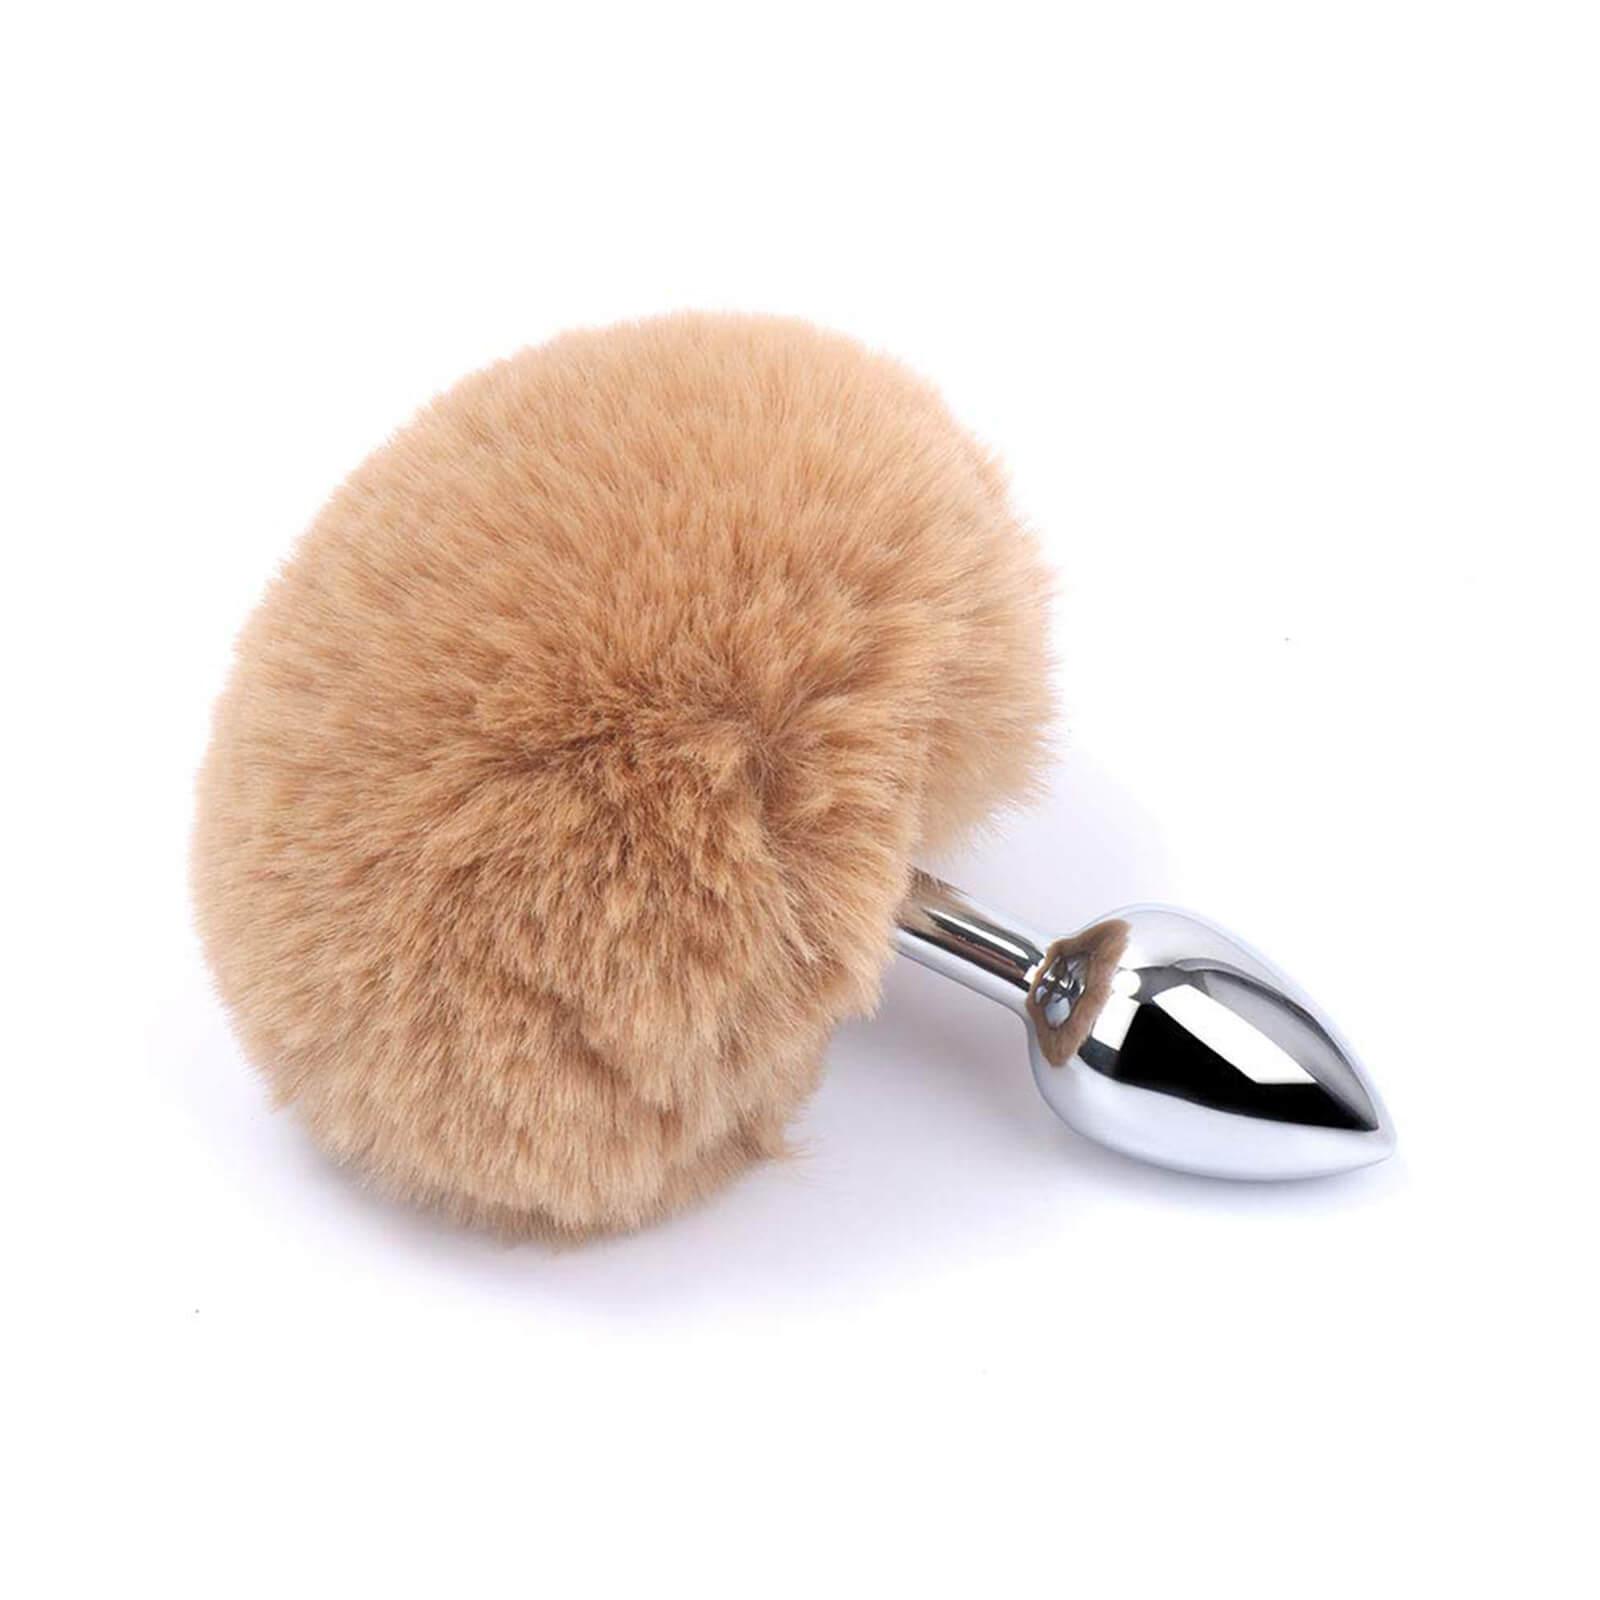 HIJUNMI Fluffy Bunny Tail Anal Plug